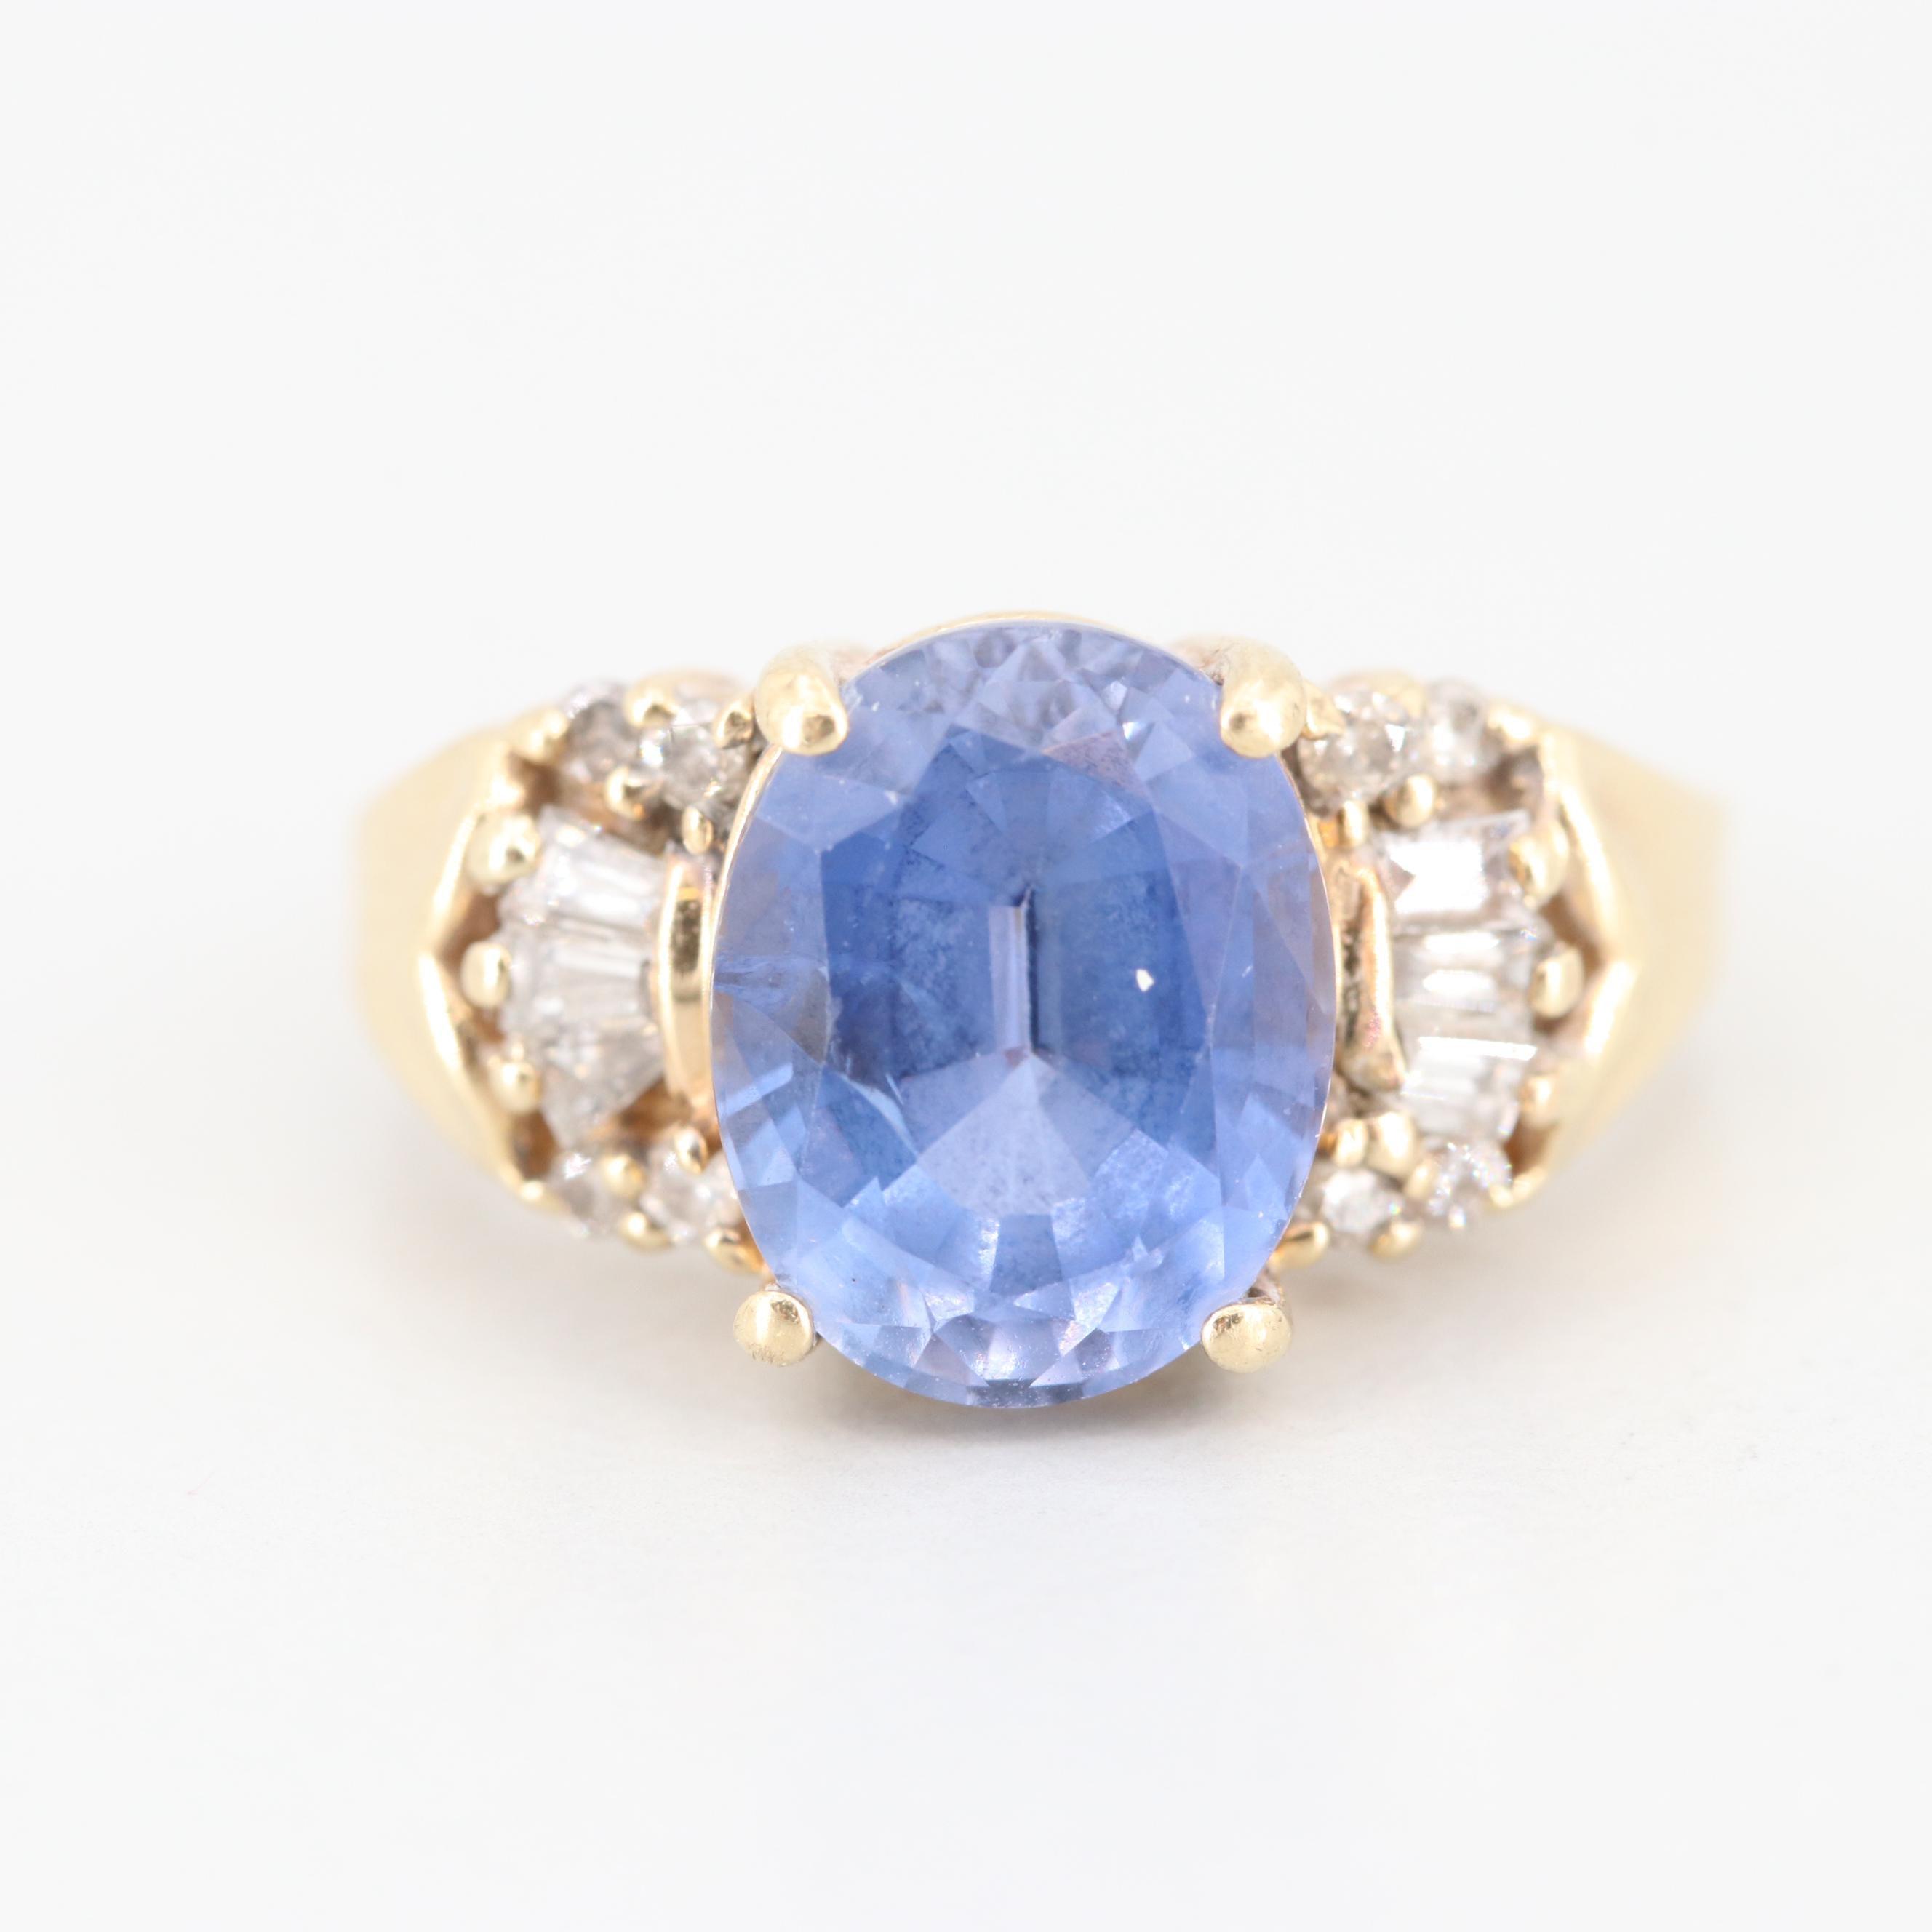 10K Yellow Gold 3.71 CT Sapphire and Diamond Ring